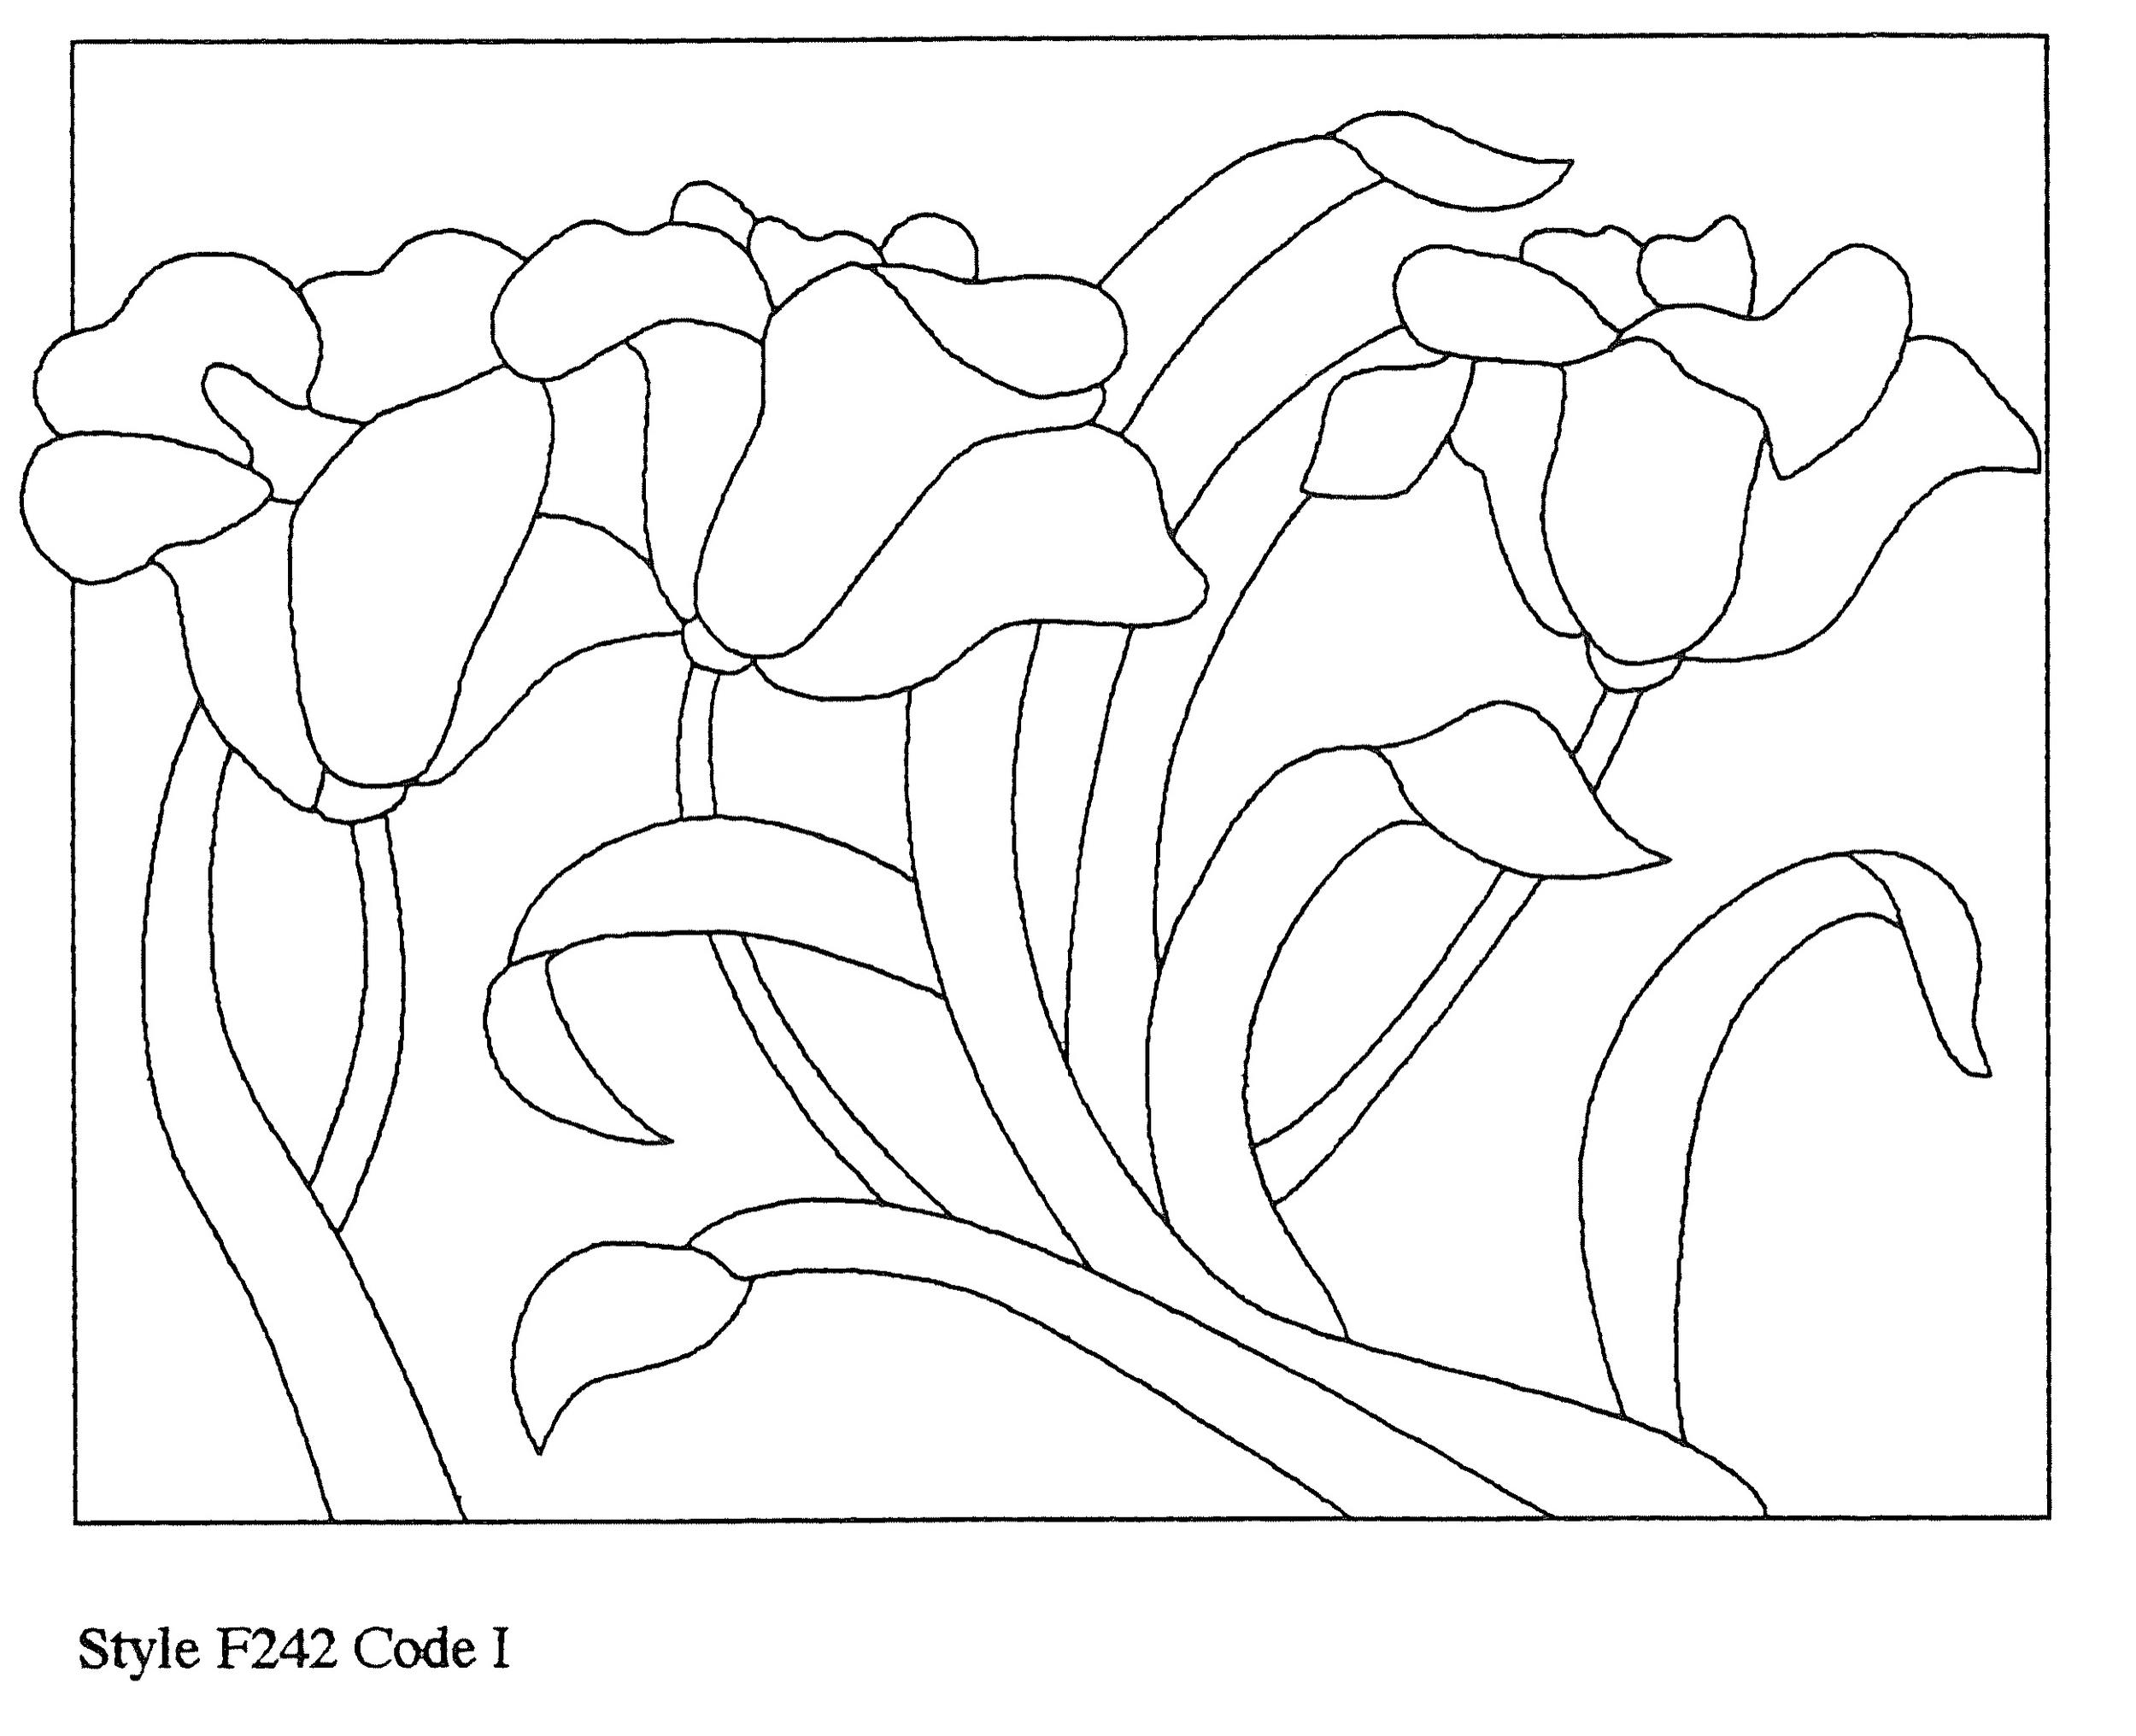 Page 11 copy 2.jpg